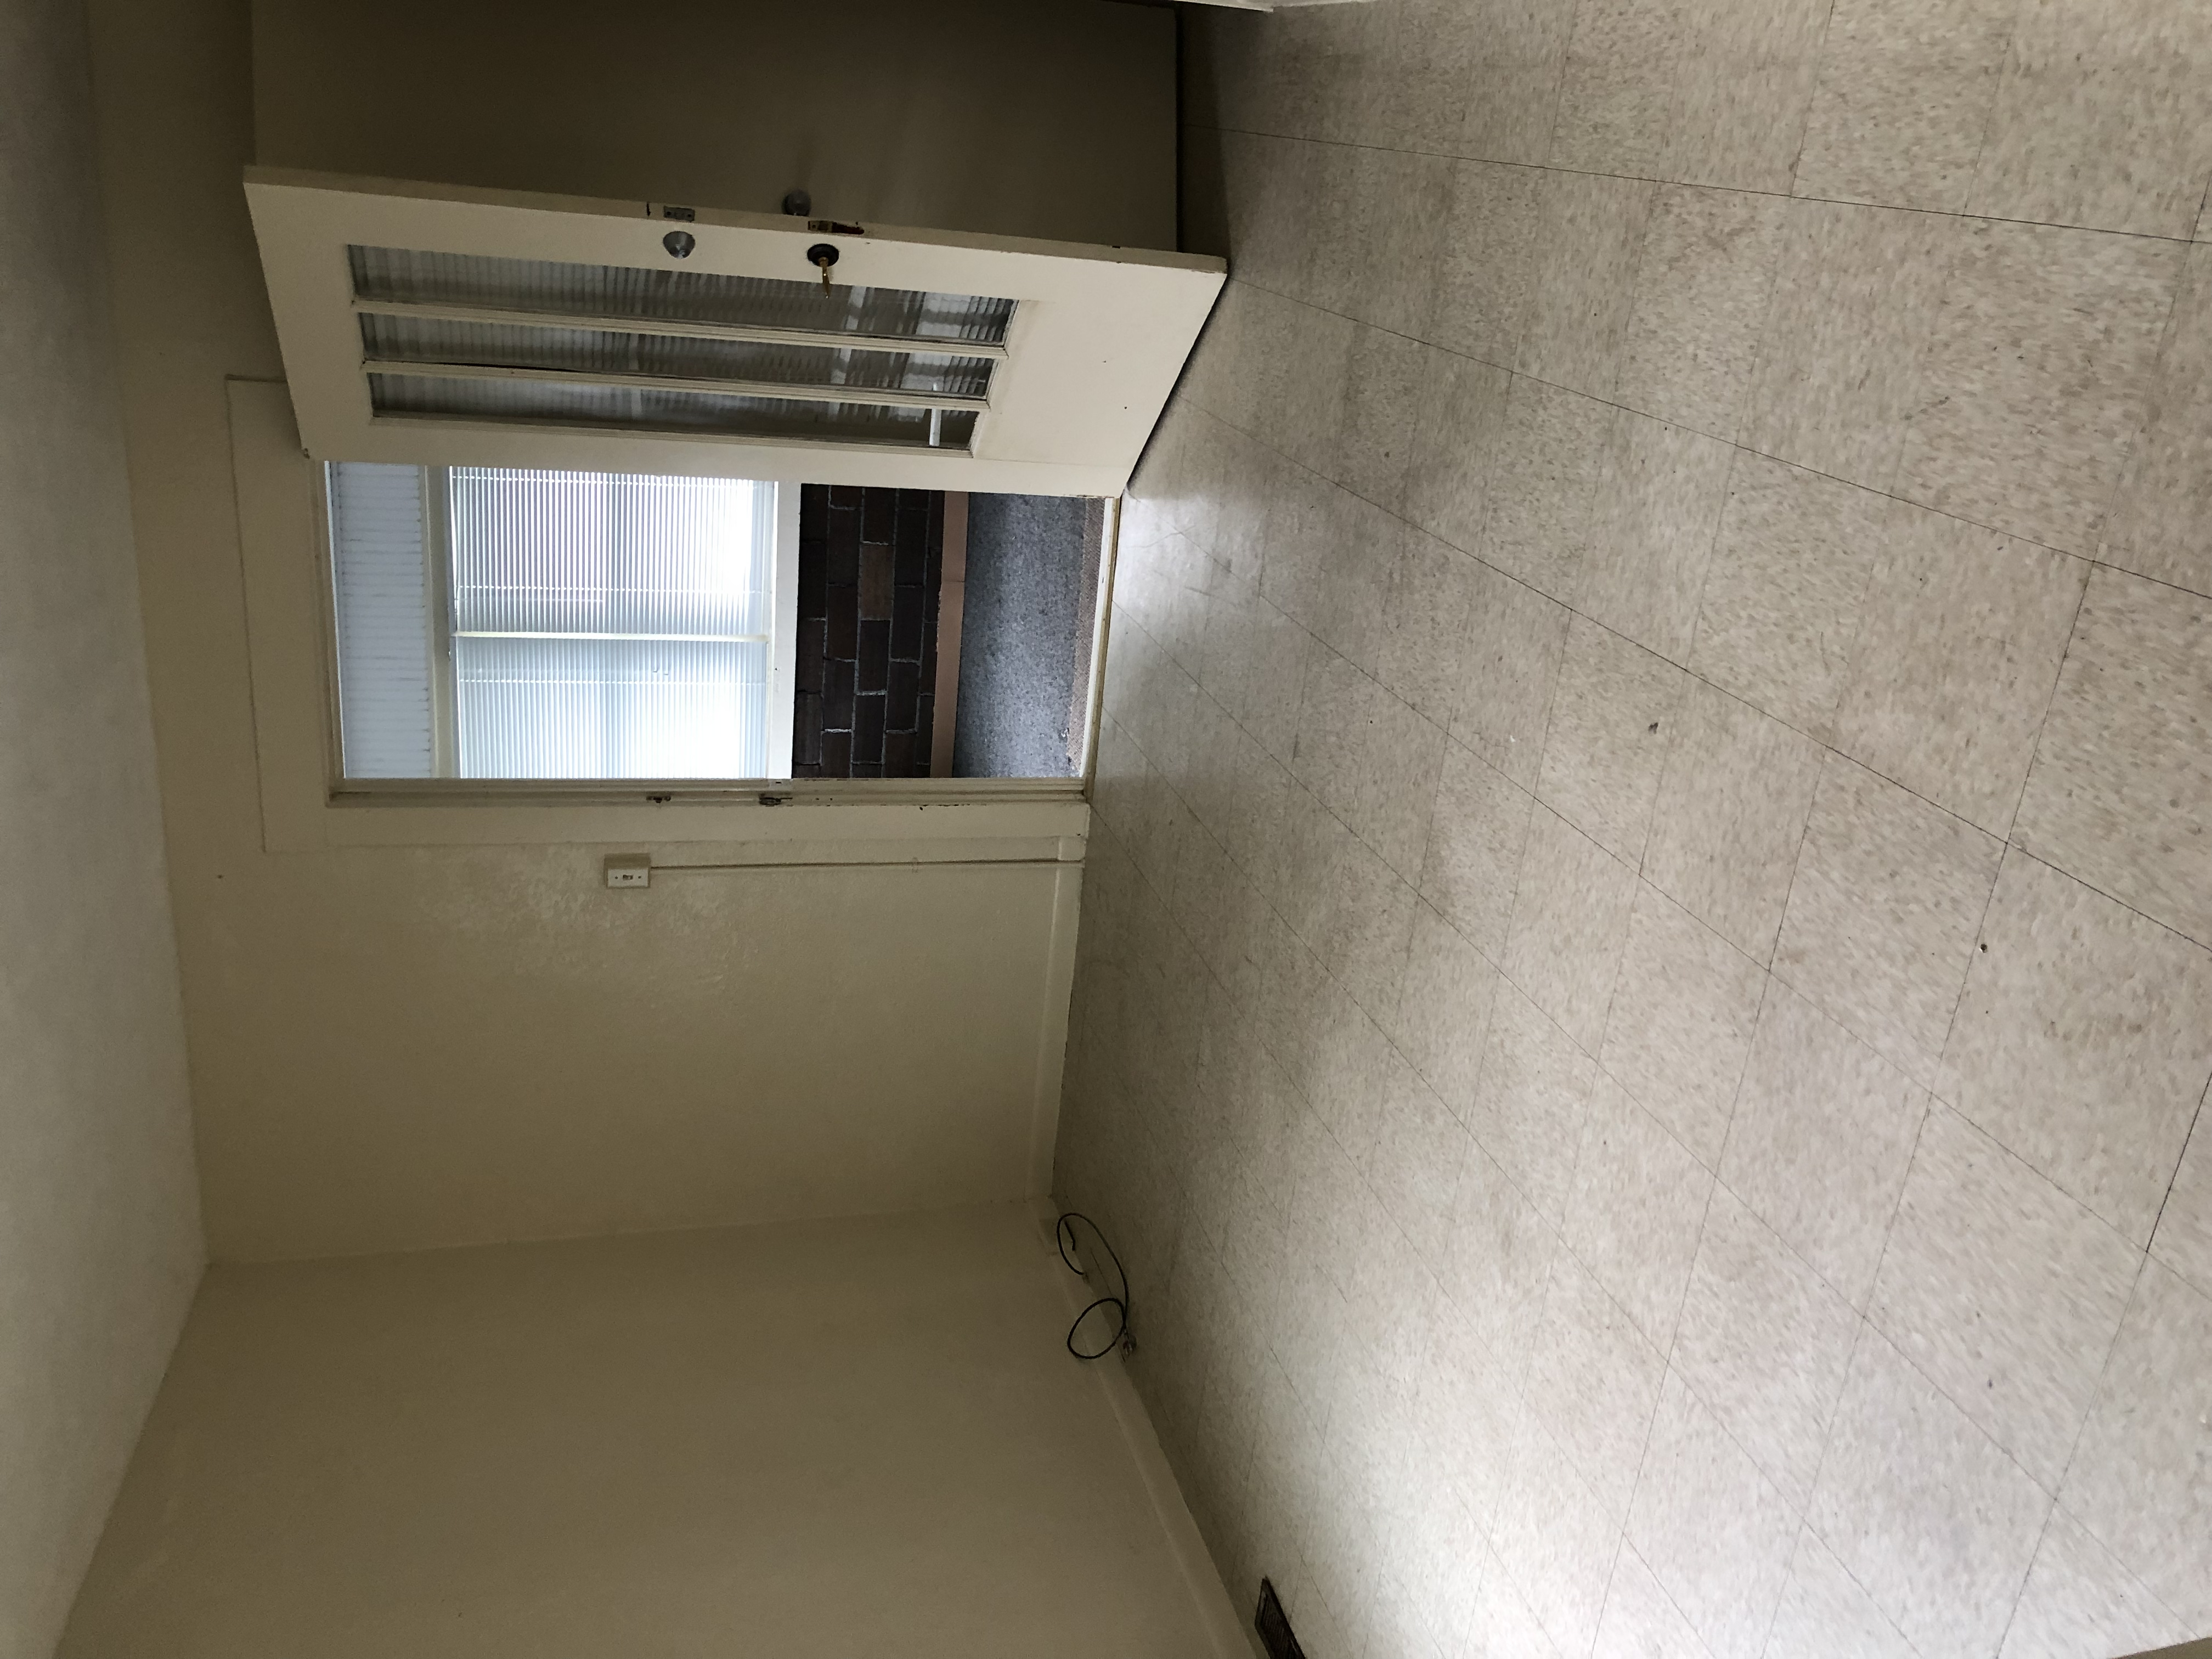 509 W 8th St. Muncie -06